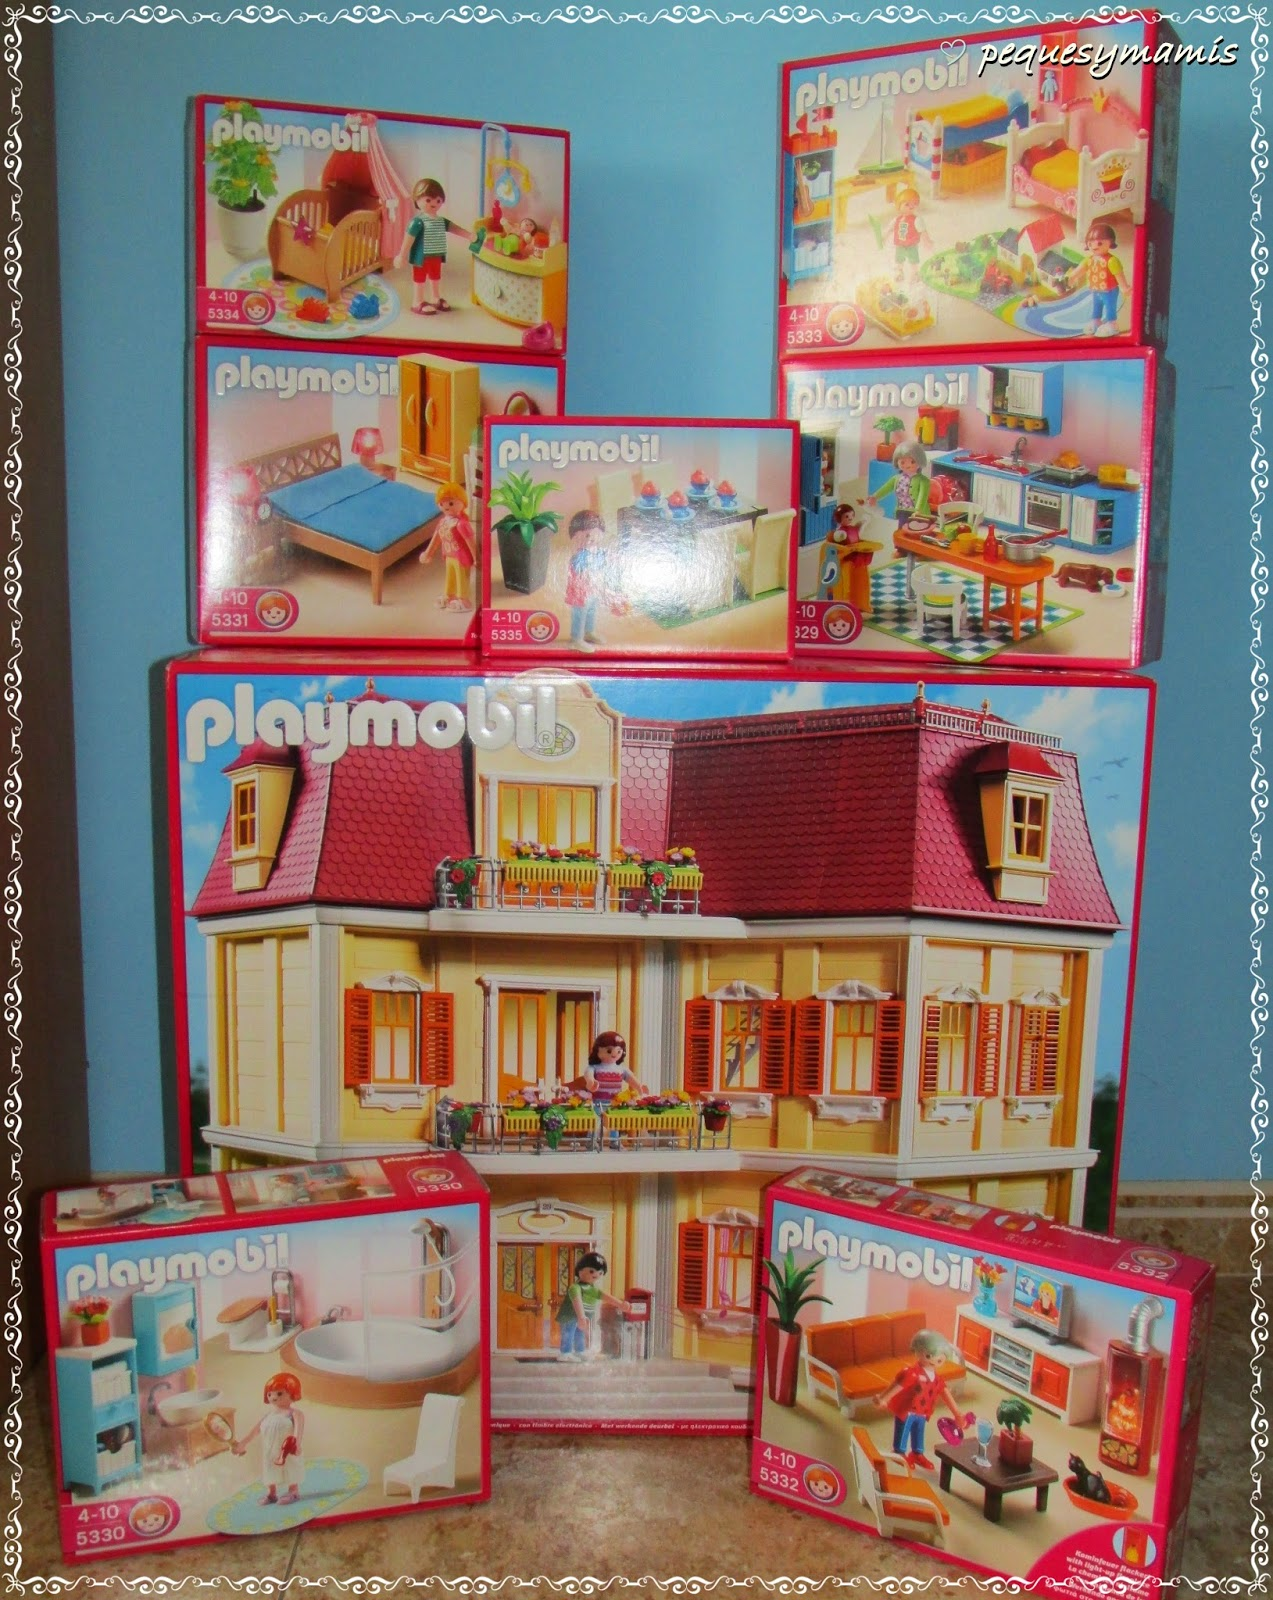 Pequesymamis mi gran casa de mu ecas de playmobil - Gran casa de munecas playmobil ...